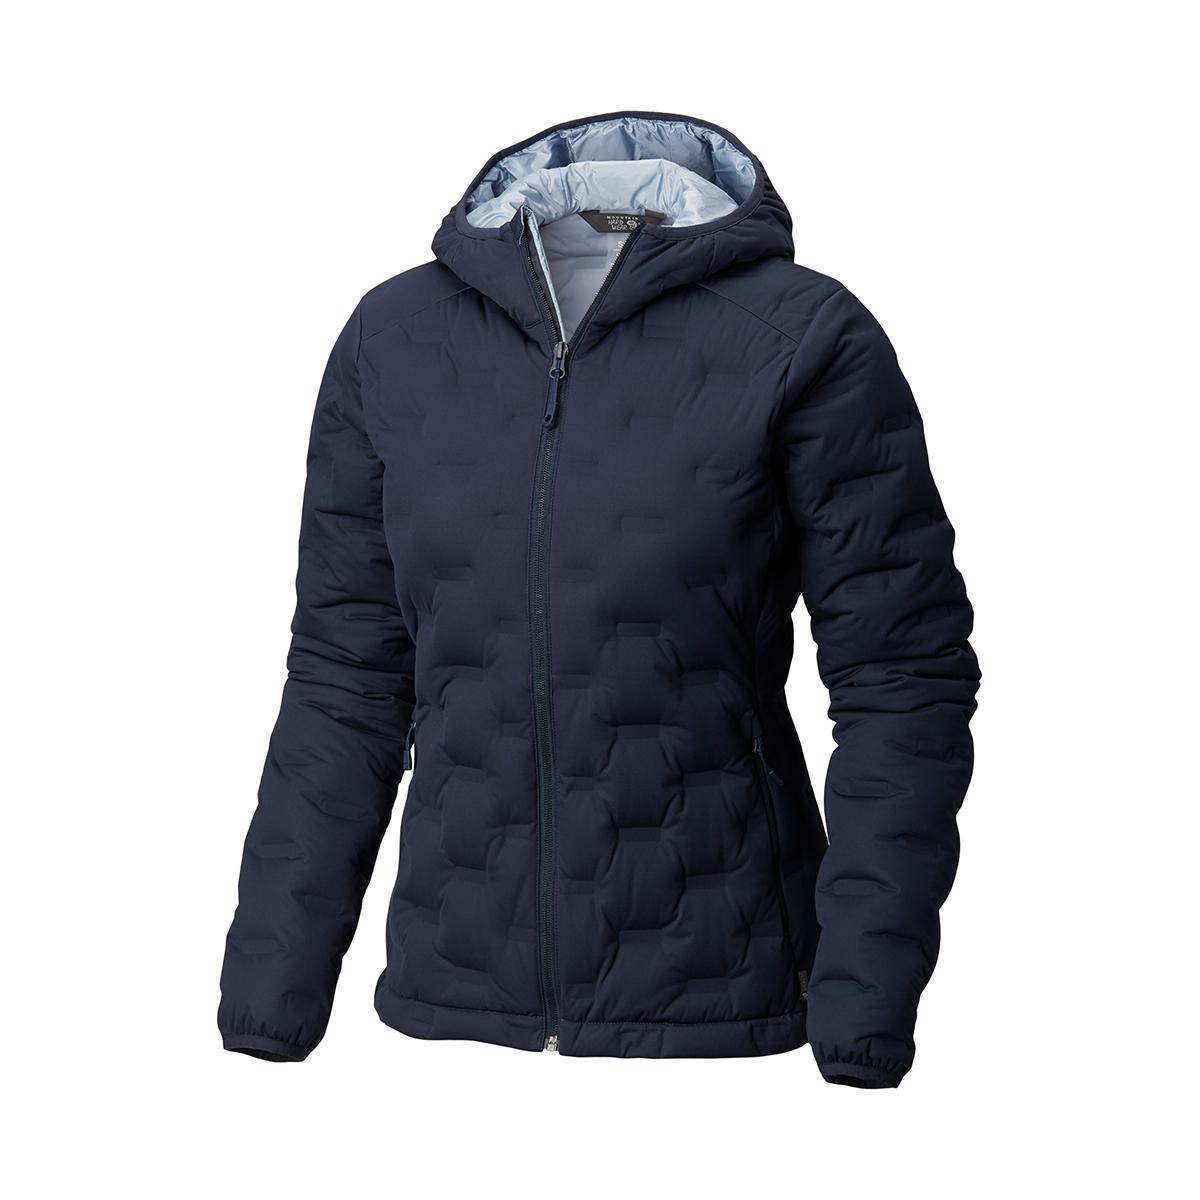 85f7b9b09 Women's StretchDown DS Hooded Jacket